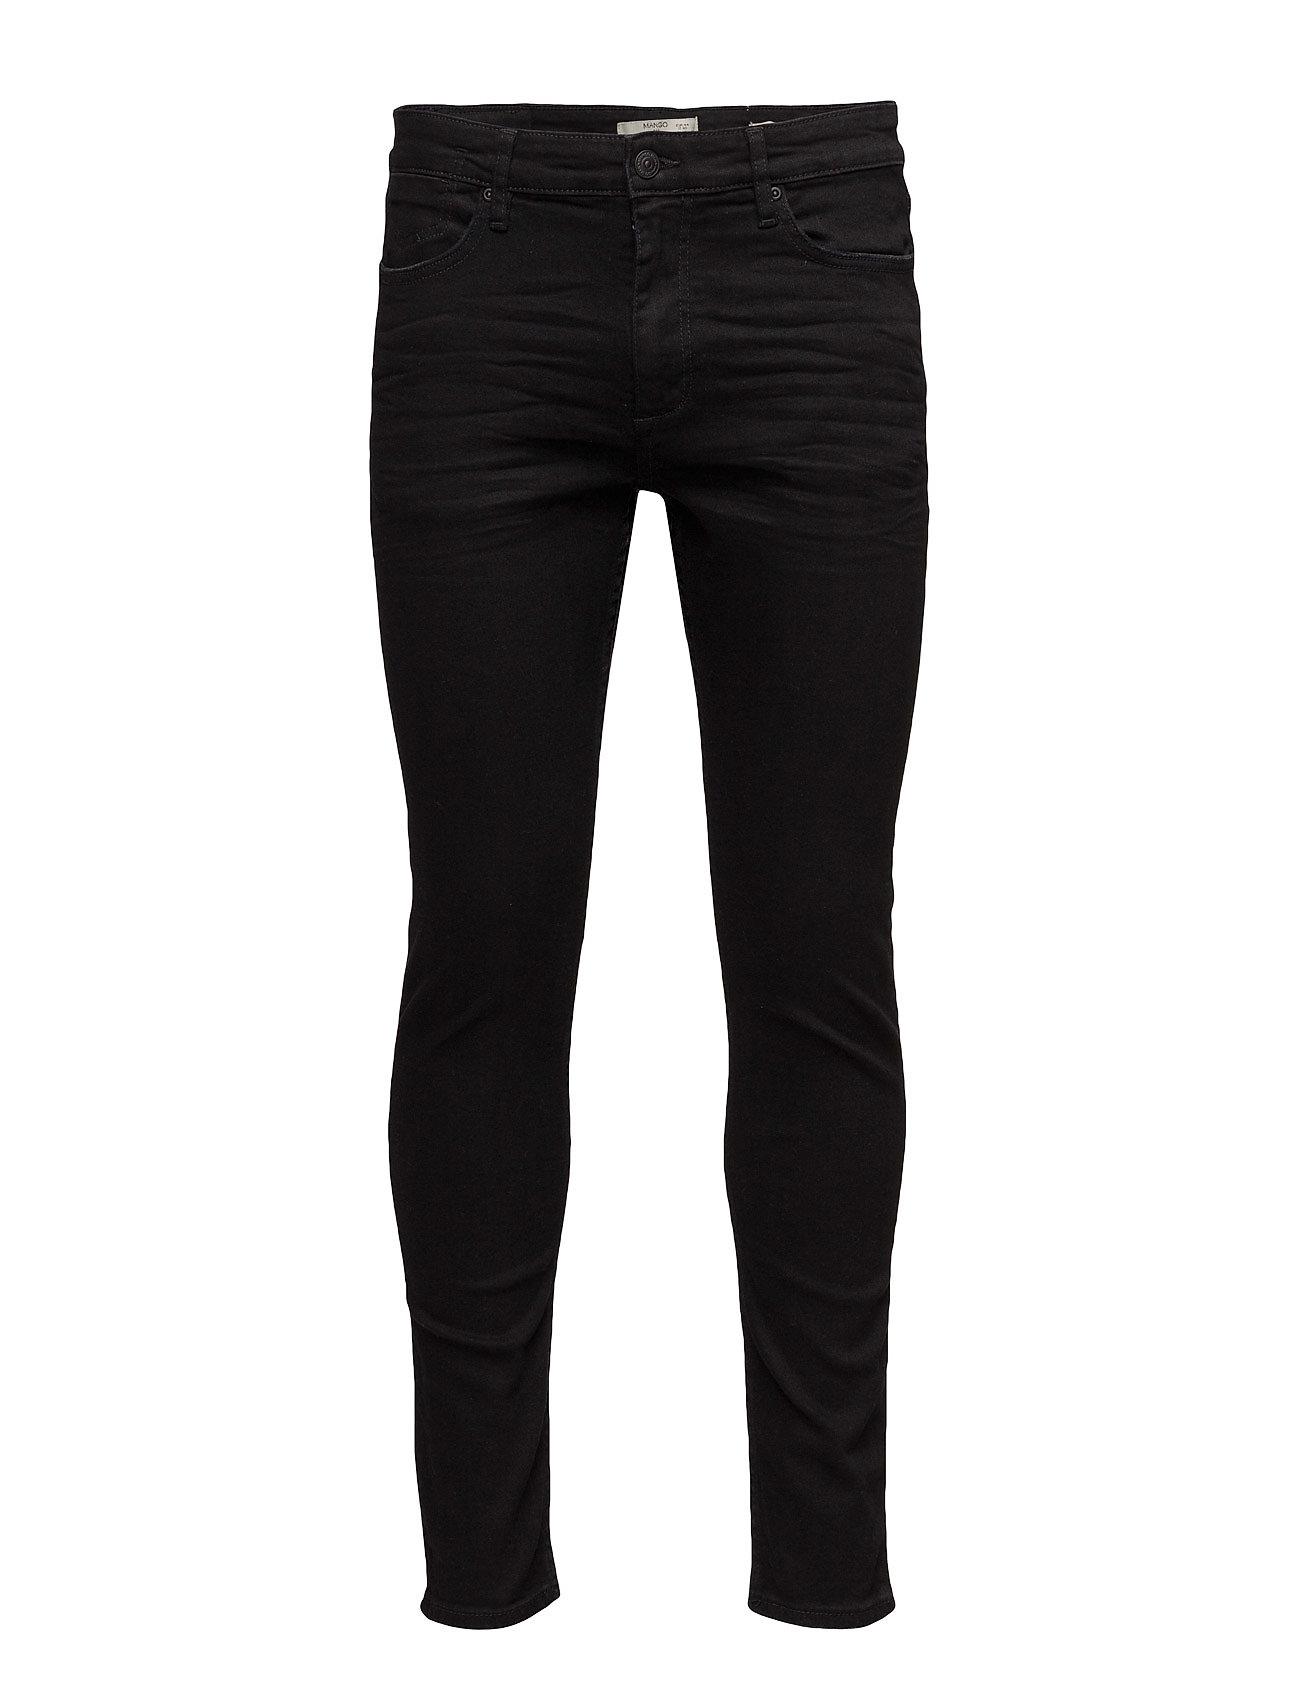 Image of Skinny Black Jude Jeans (2604978339)